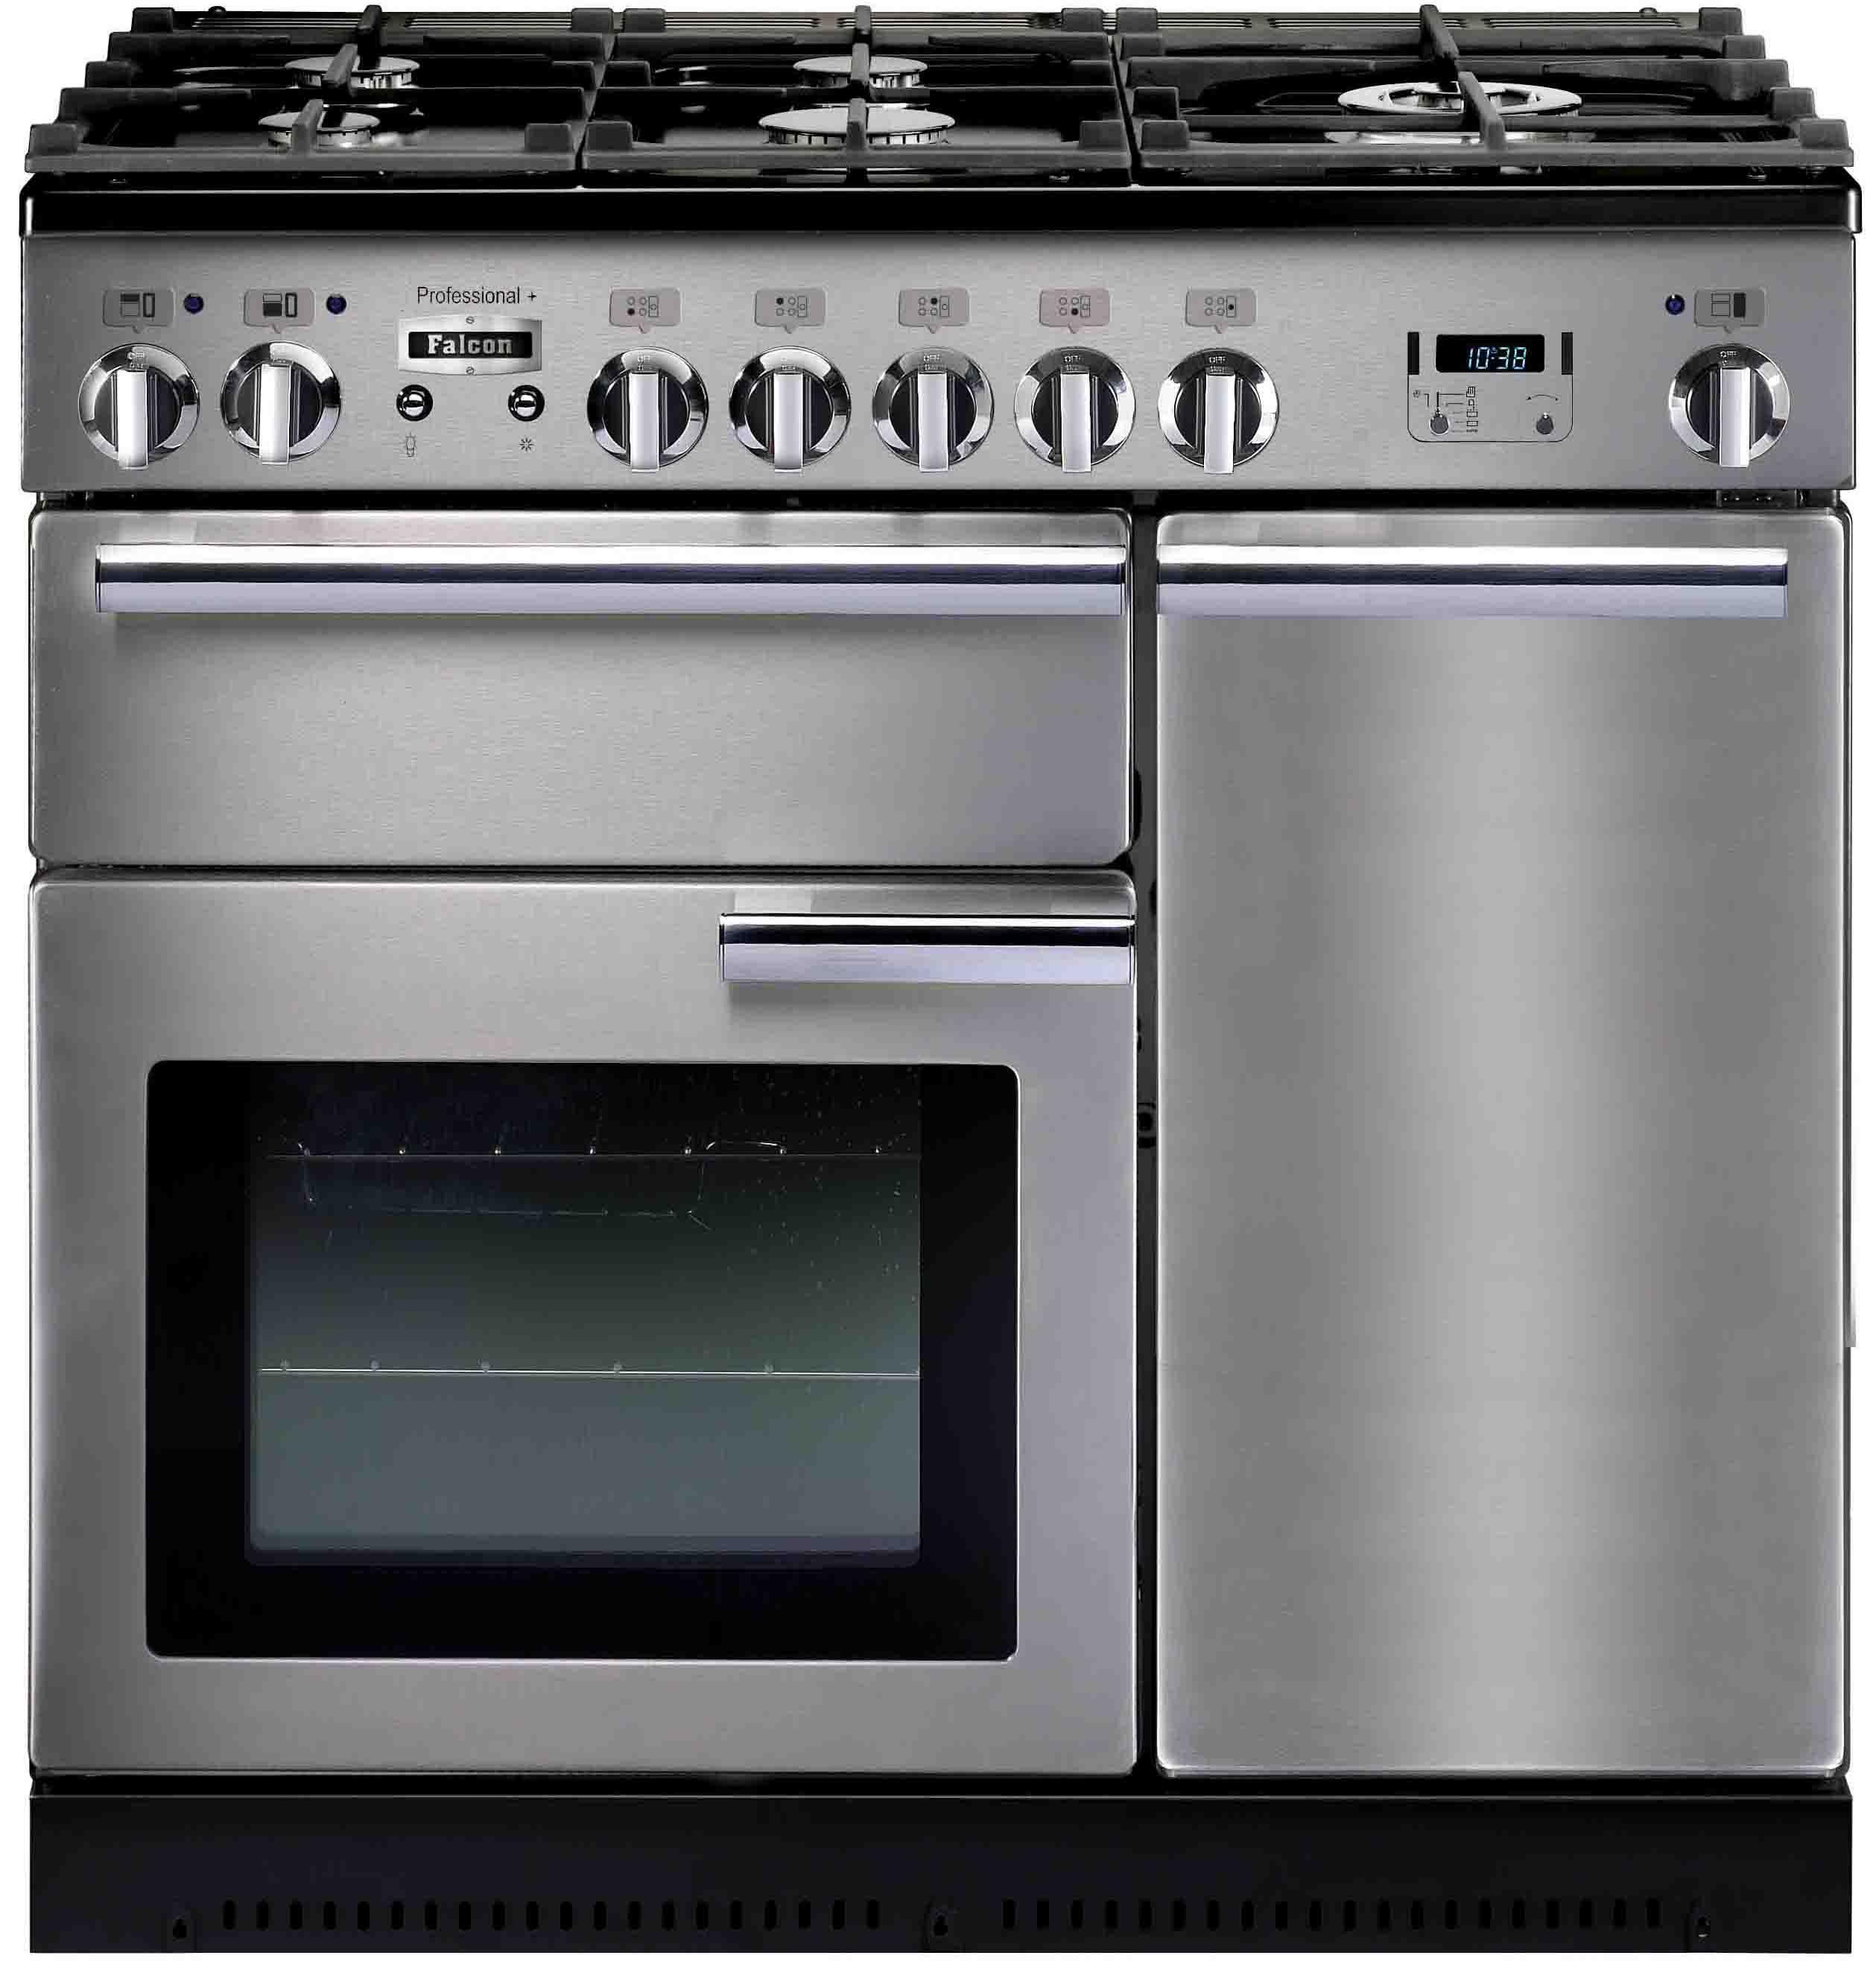 Falcon cuisinire tout gaz prop90dfssceu - Cuisiniere piano tout gaz ...